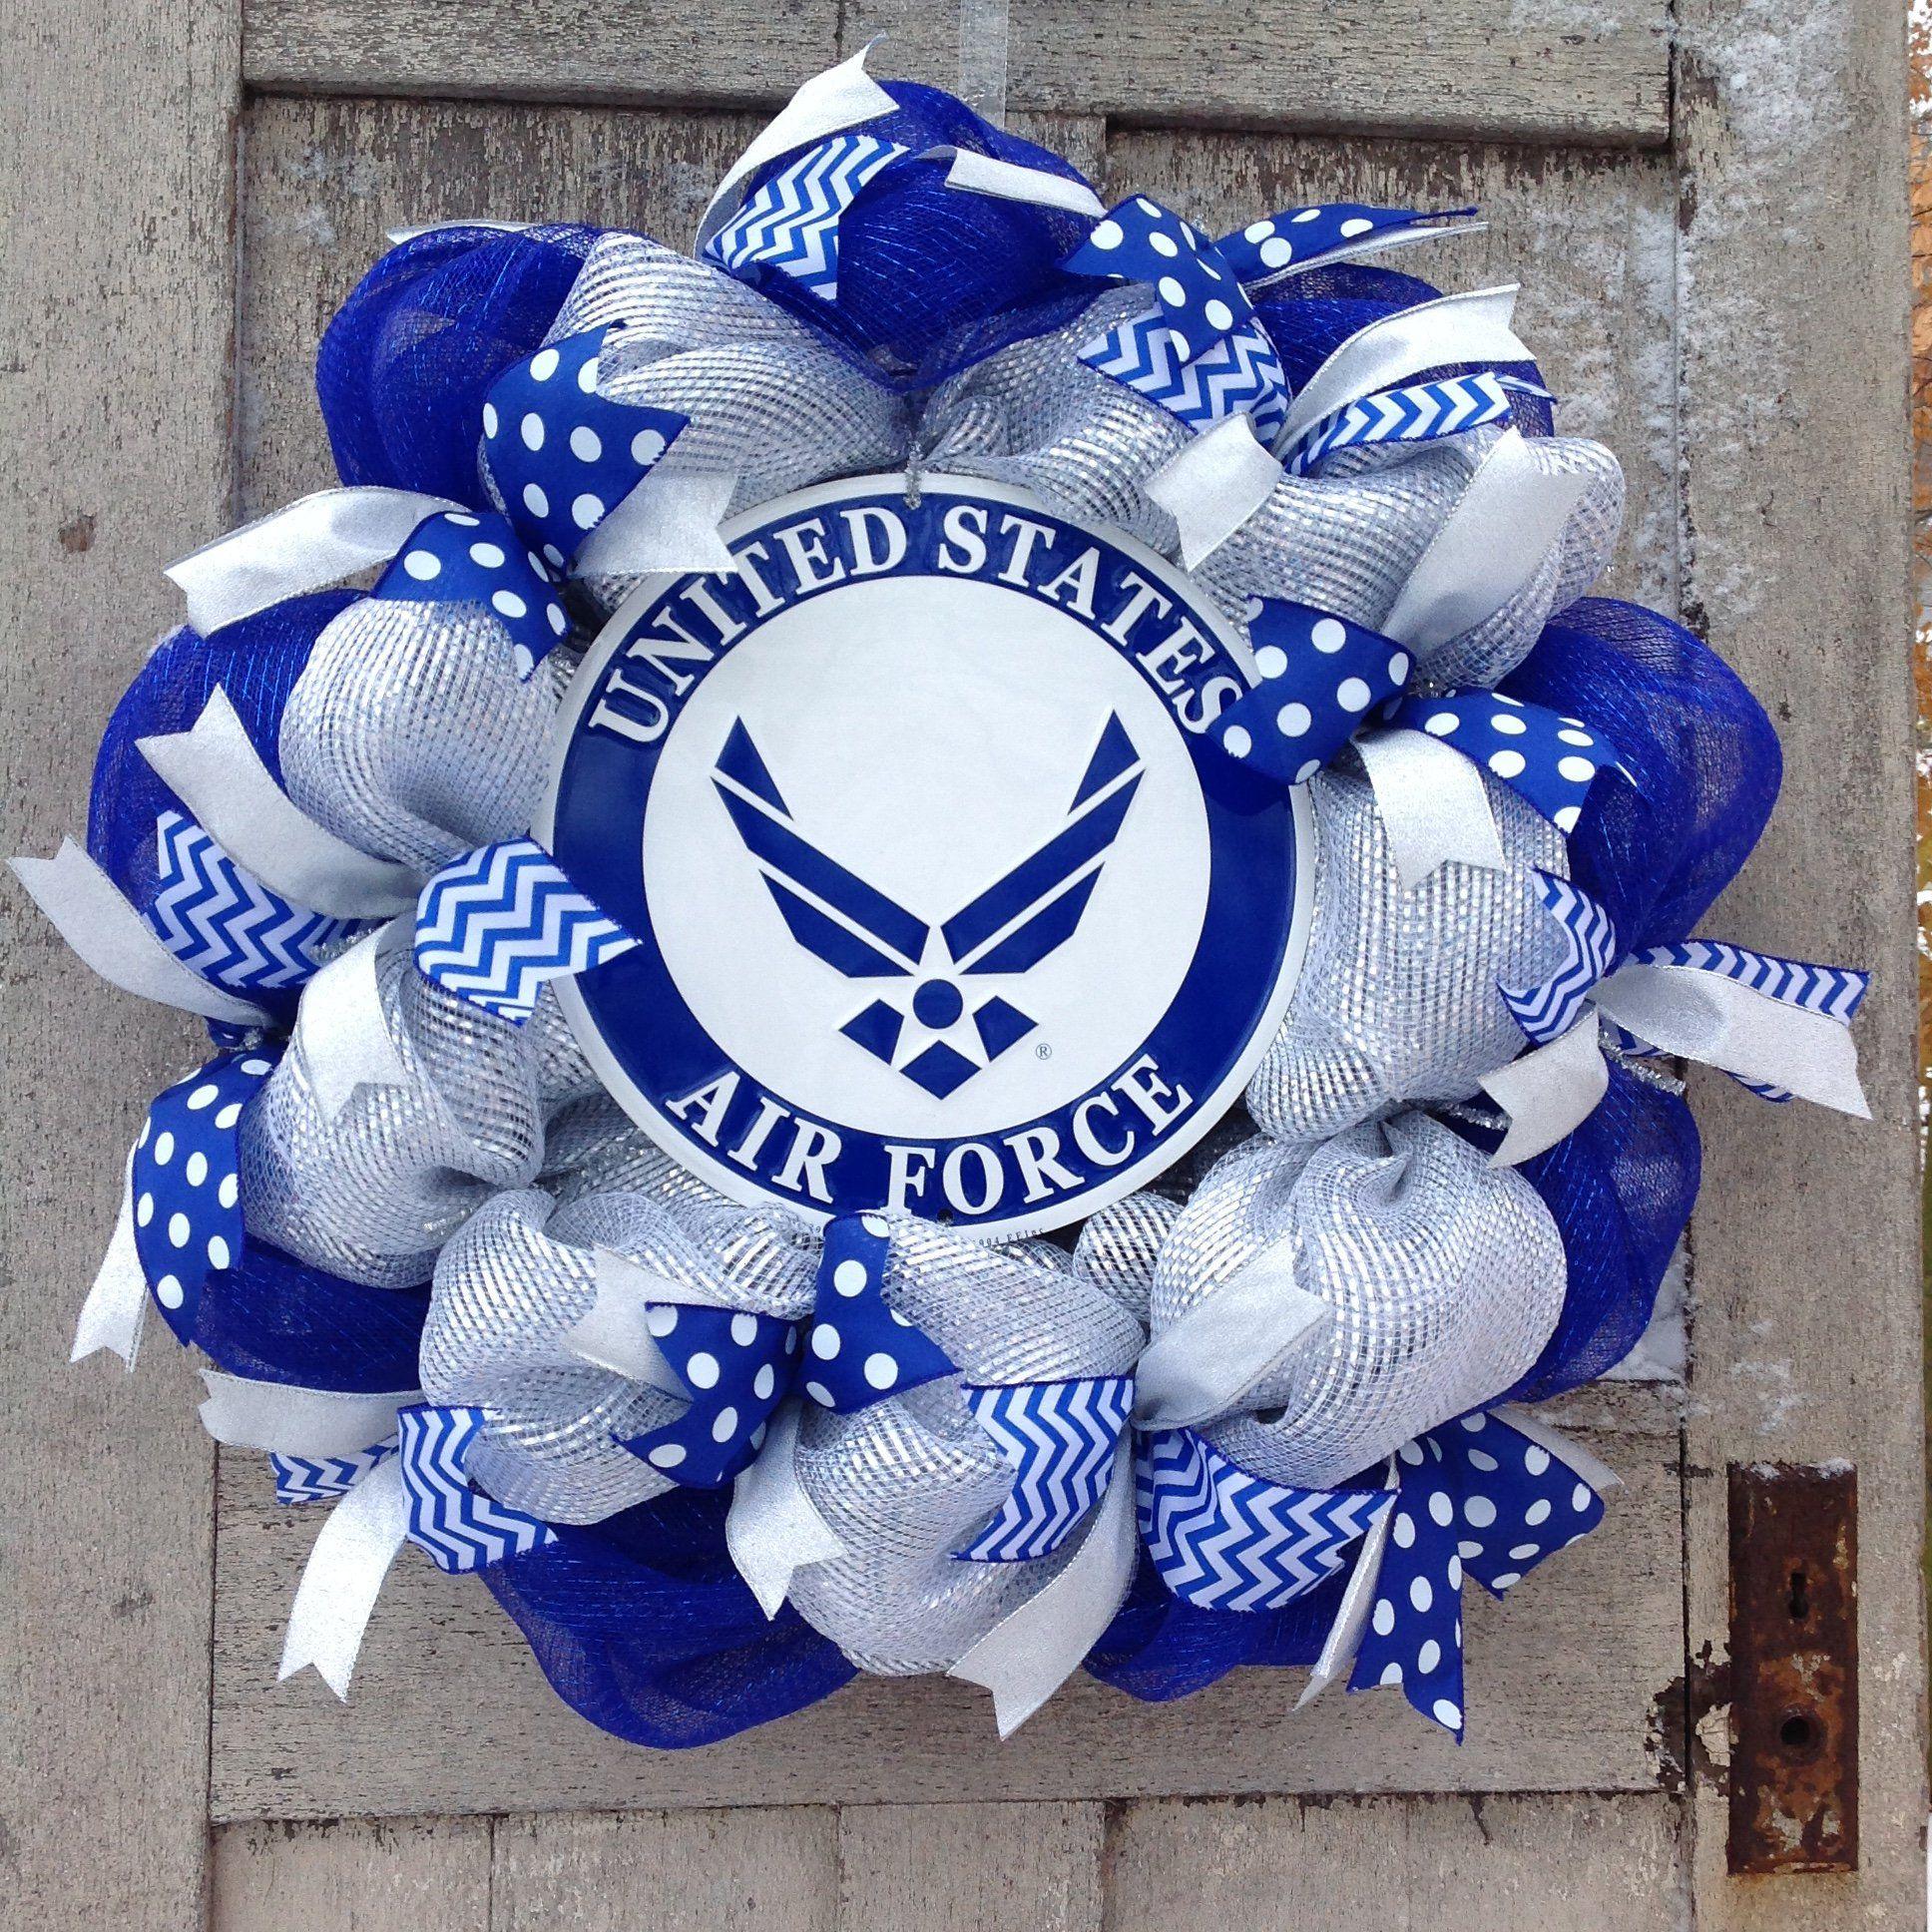 Air Force wreath, U.S. military wreath, U.S. Air Force